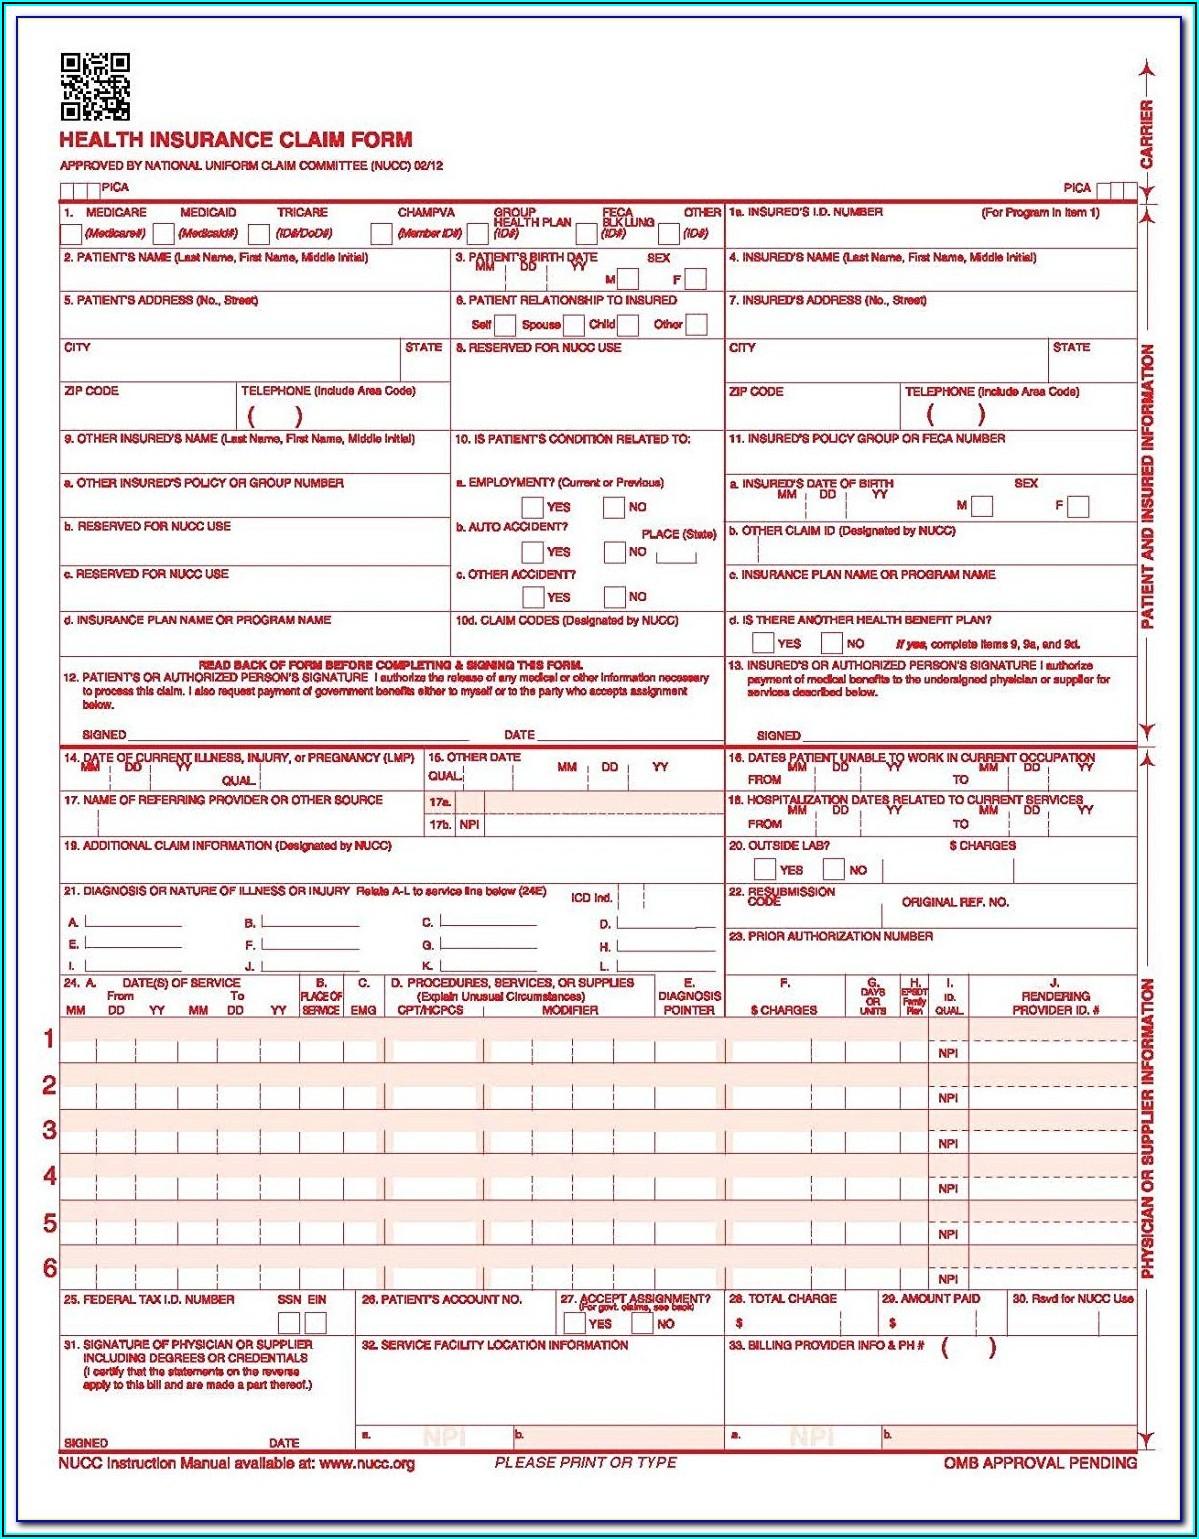 Fillable Hcfa 1500 Form